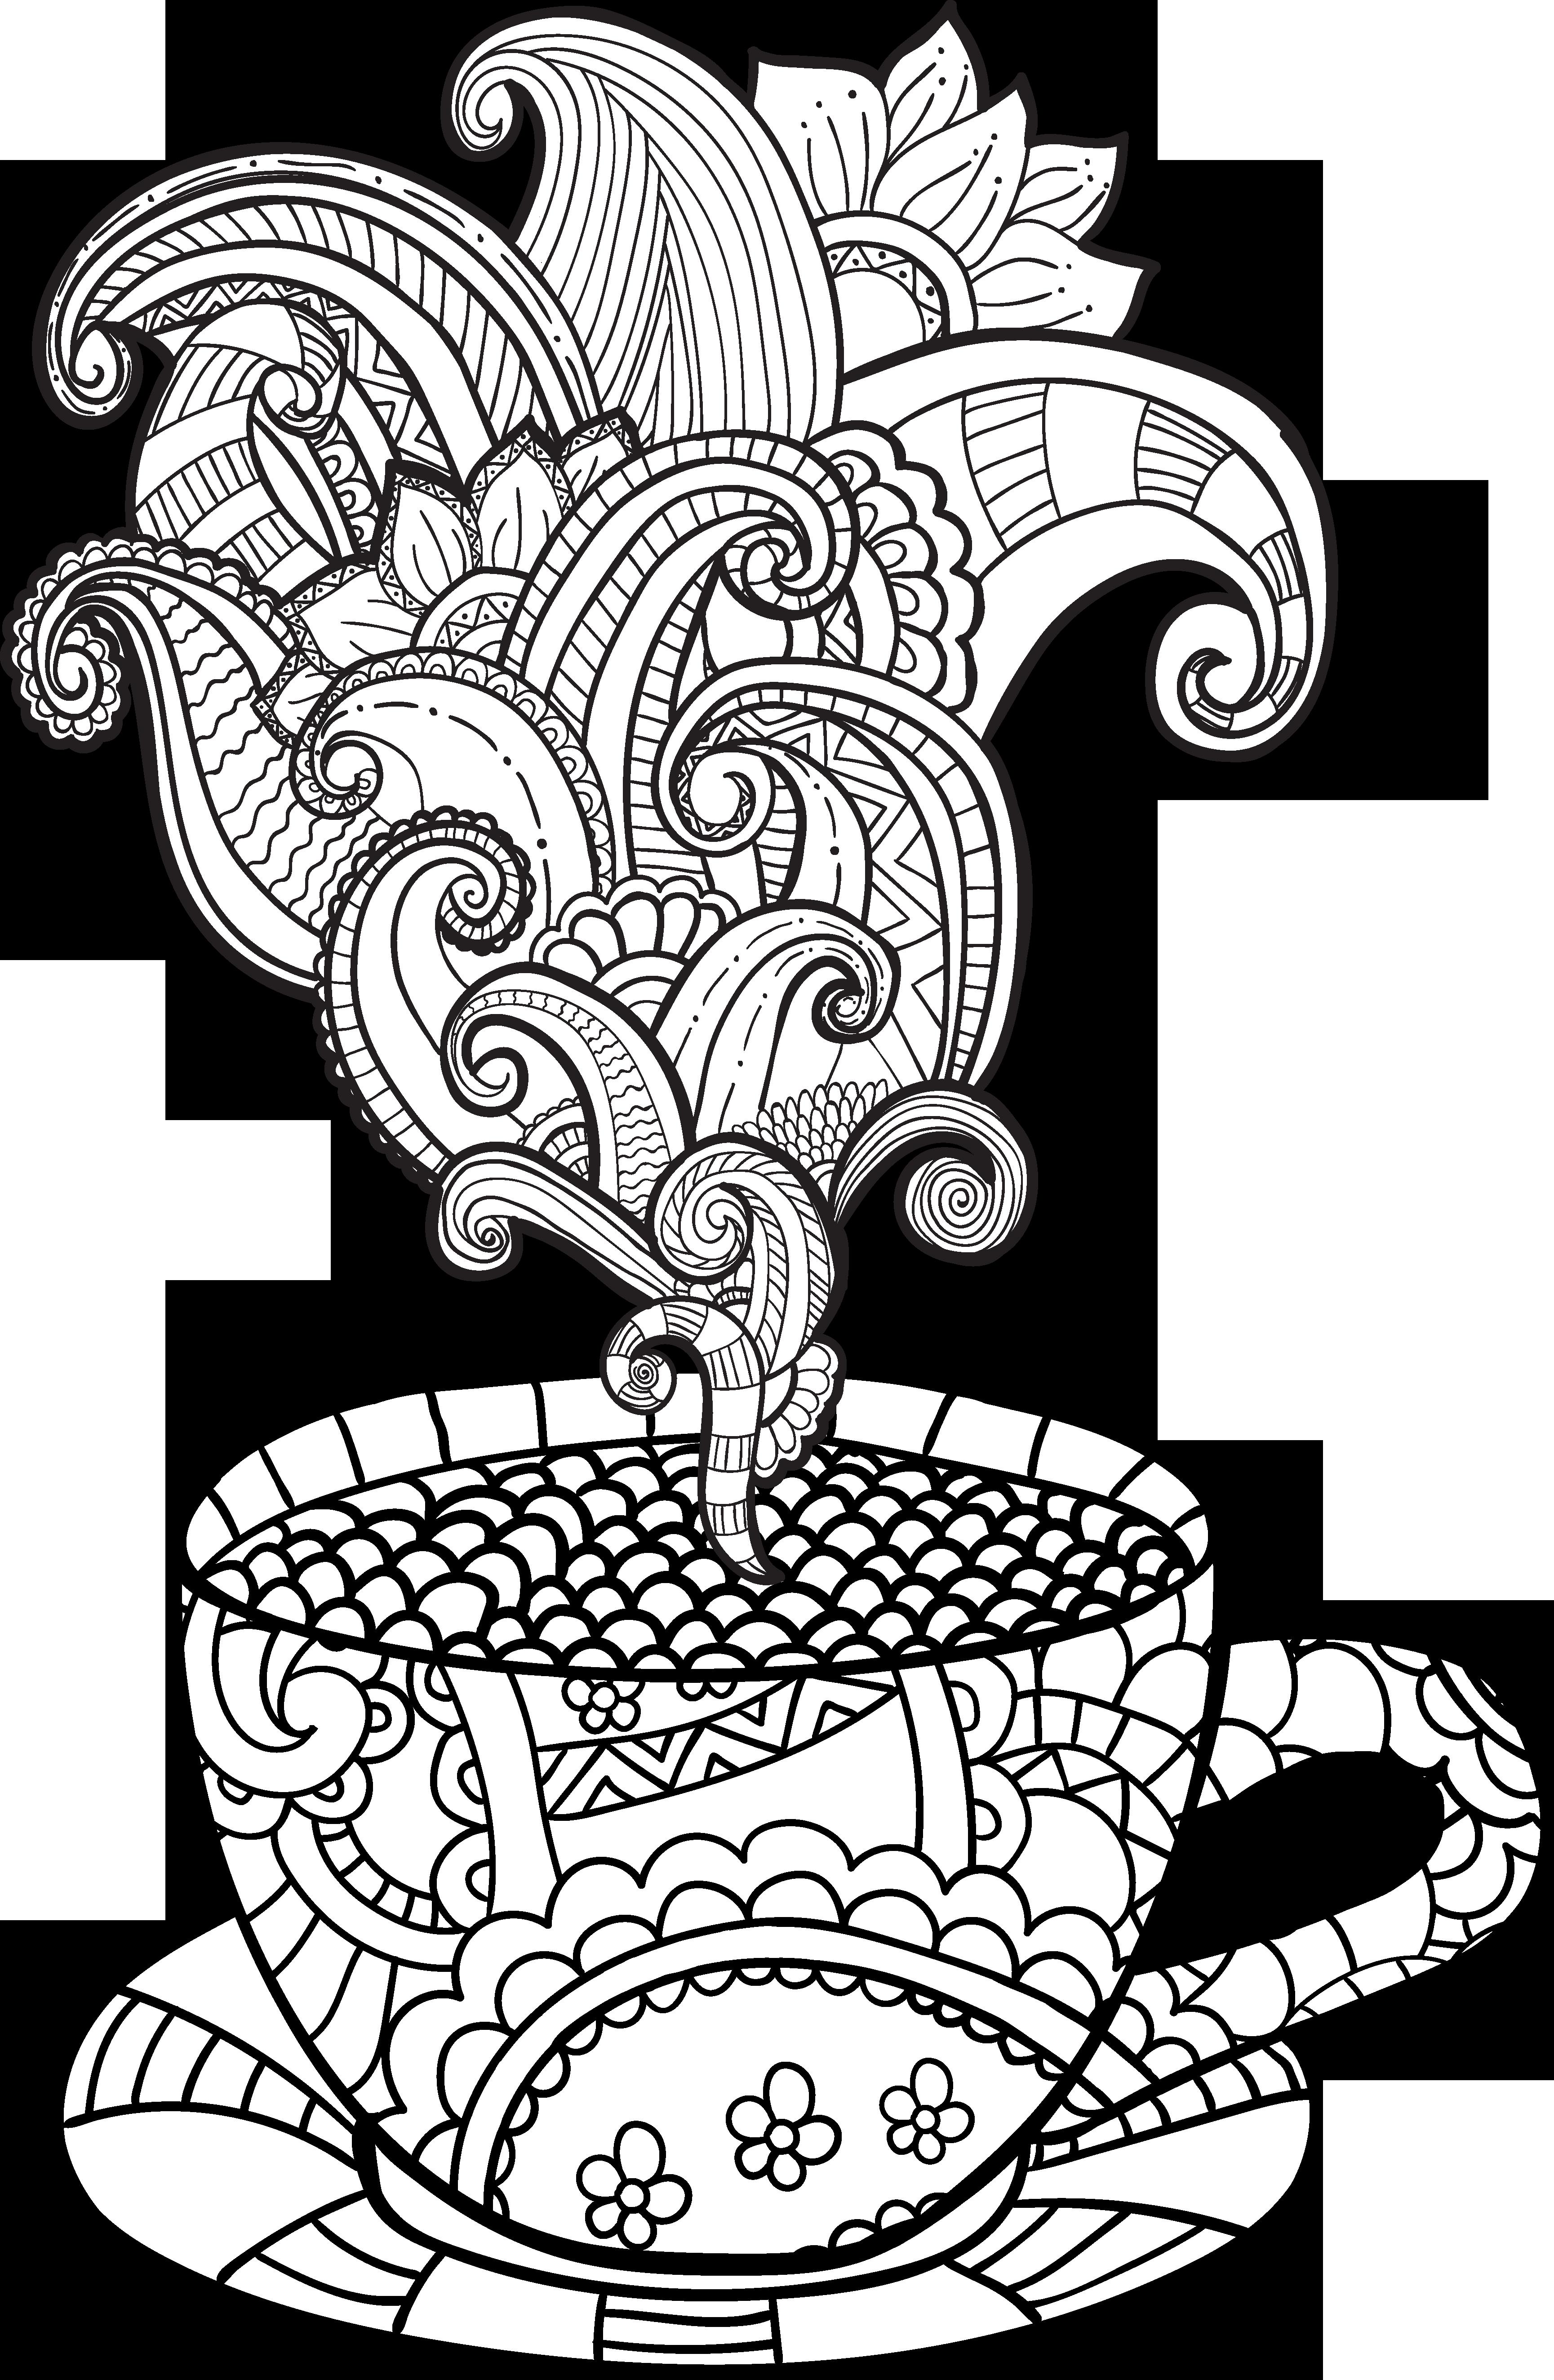 imagem relacionada  adult coloring pages coloring books